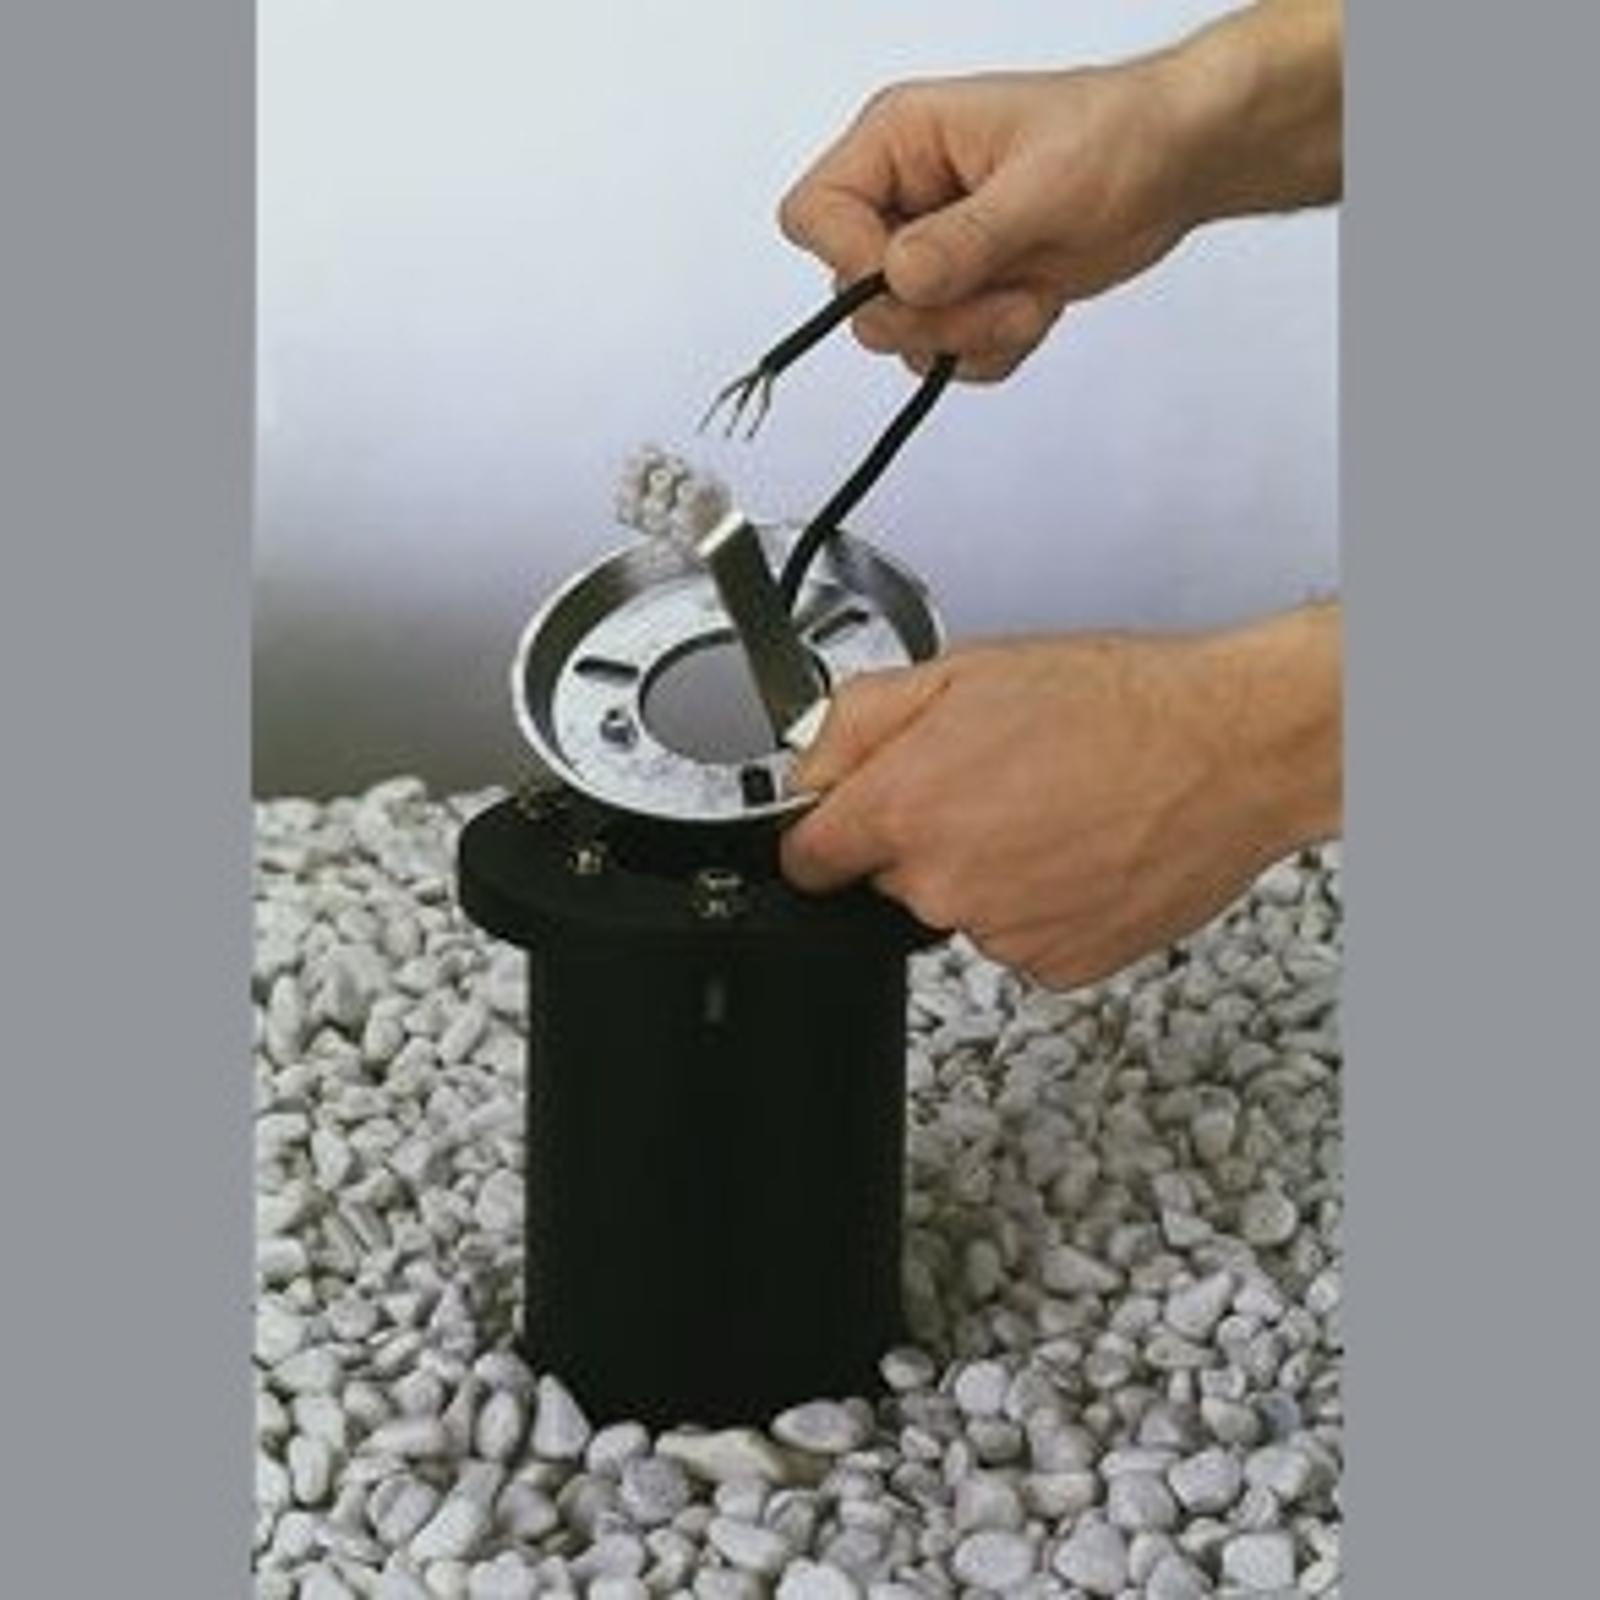 Erdeinbausockel Aluminiumguss, Einbautiefe 50cm